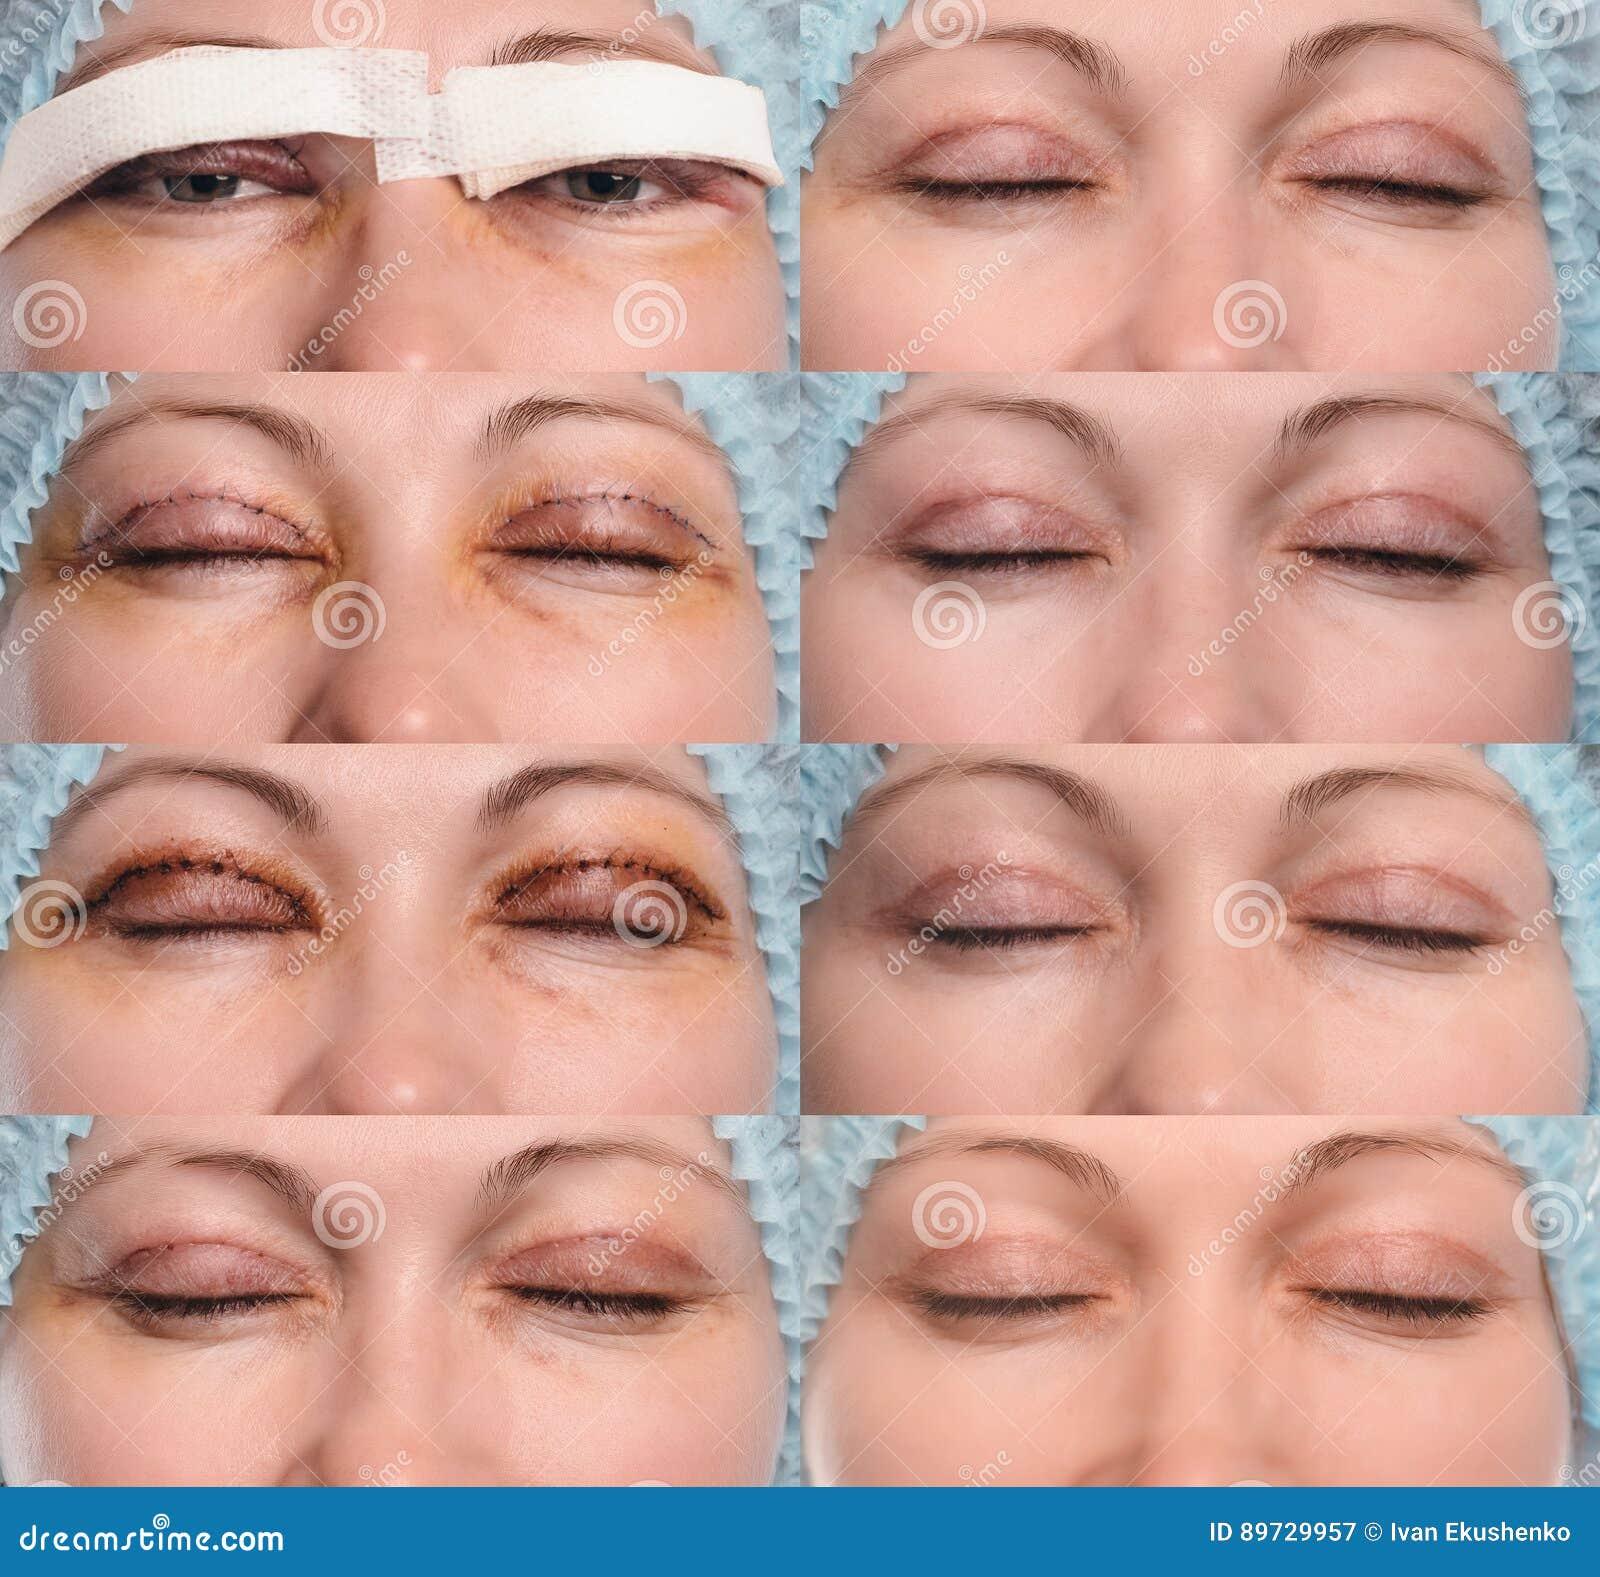 Upper blepharoplasty recovery photos Eyelid Surgery (Blepharoplasty) - Recovery and After-care